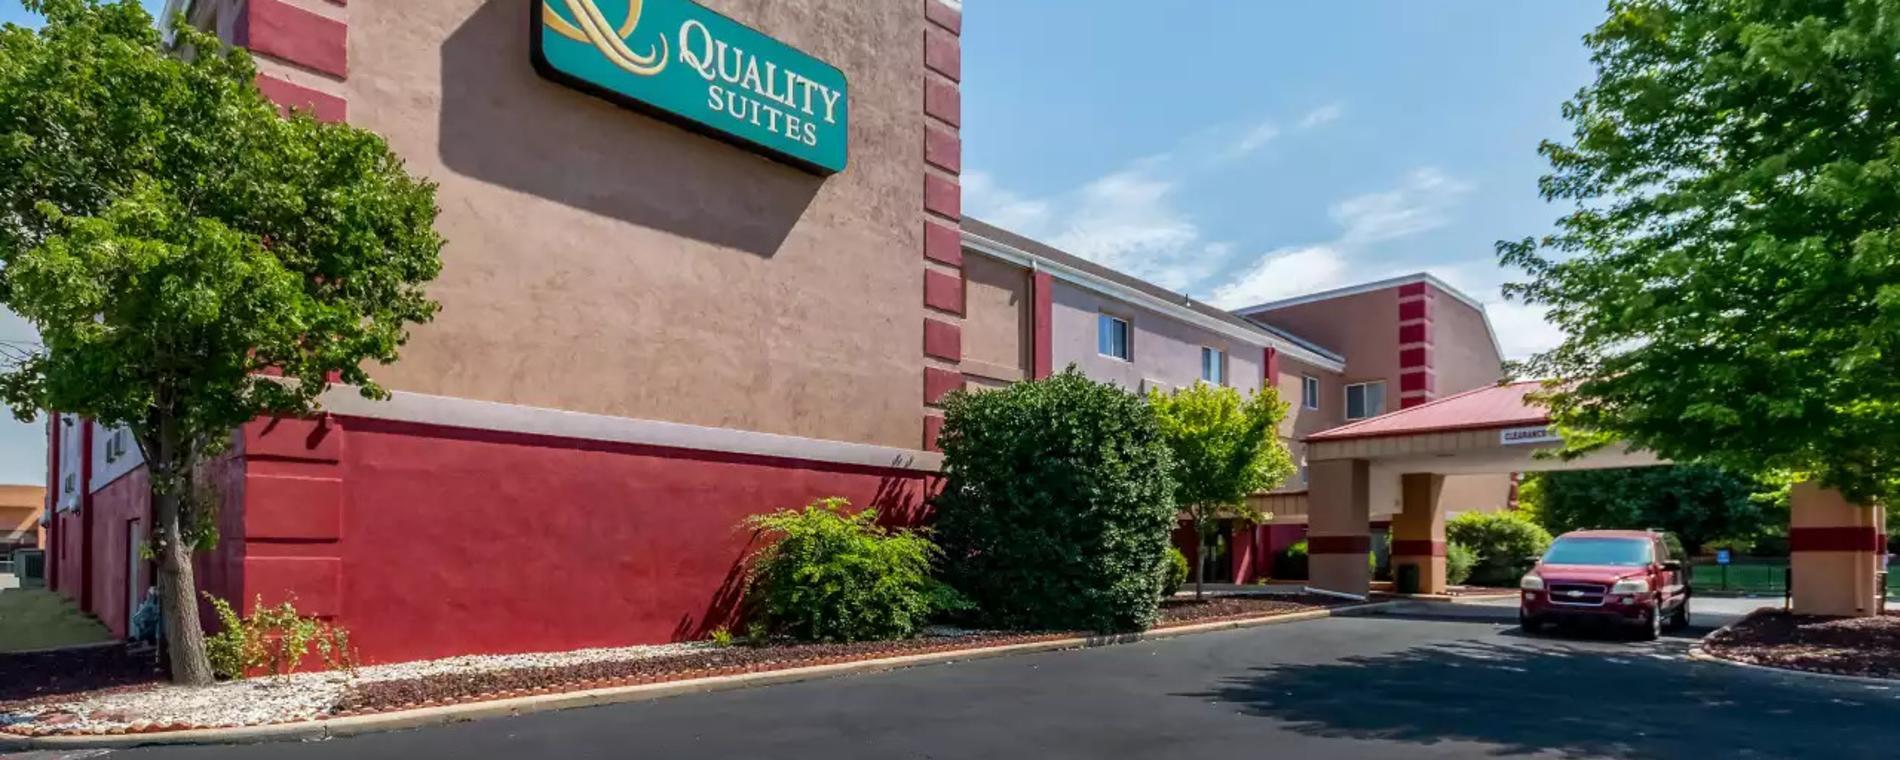 Quality Stes exterior Visit Wichita